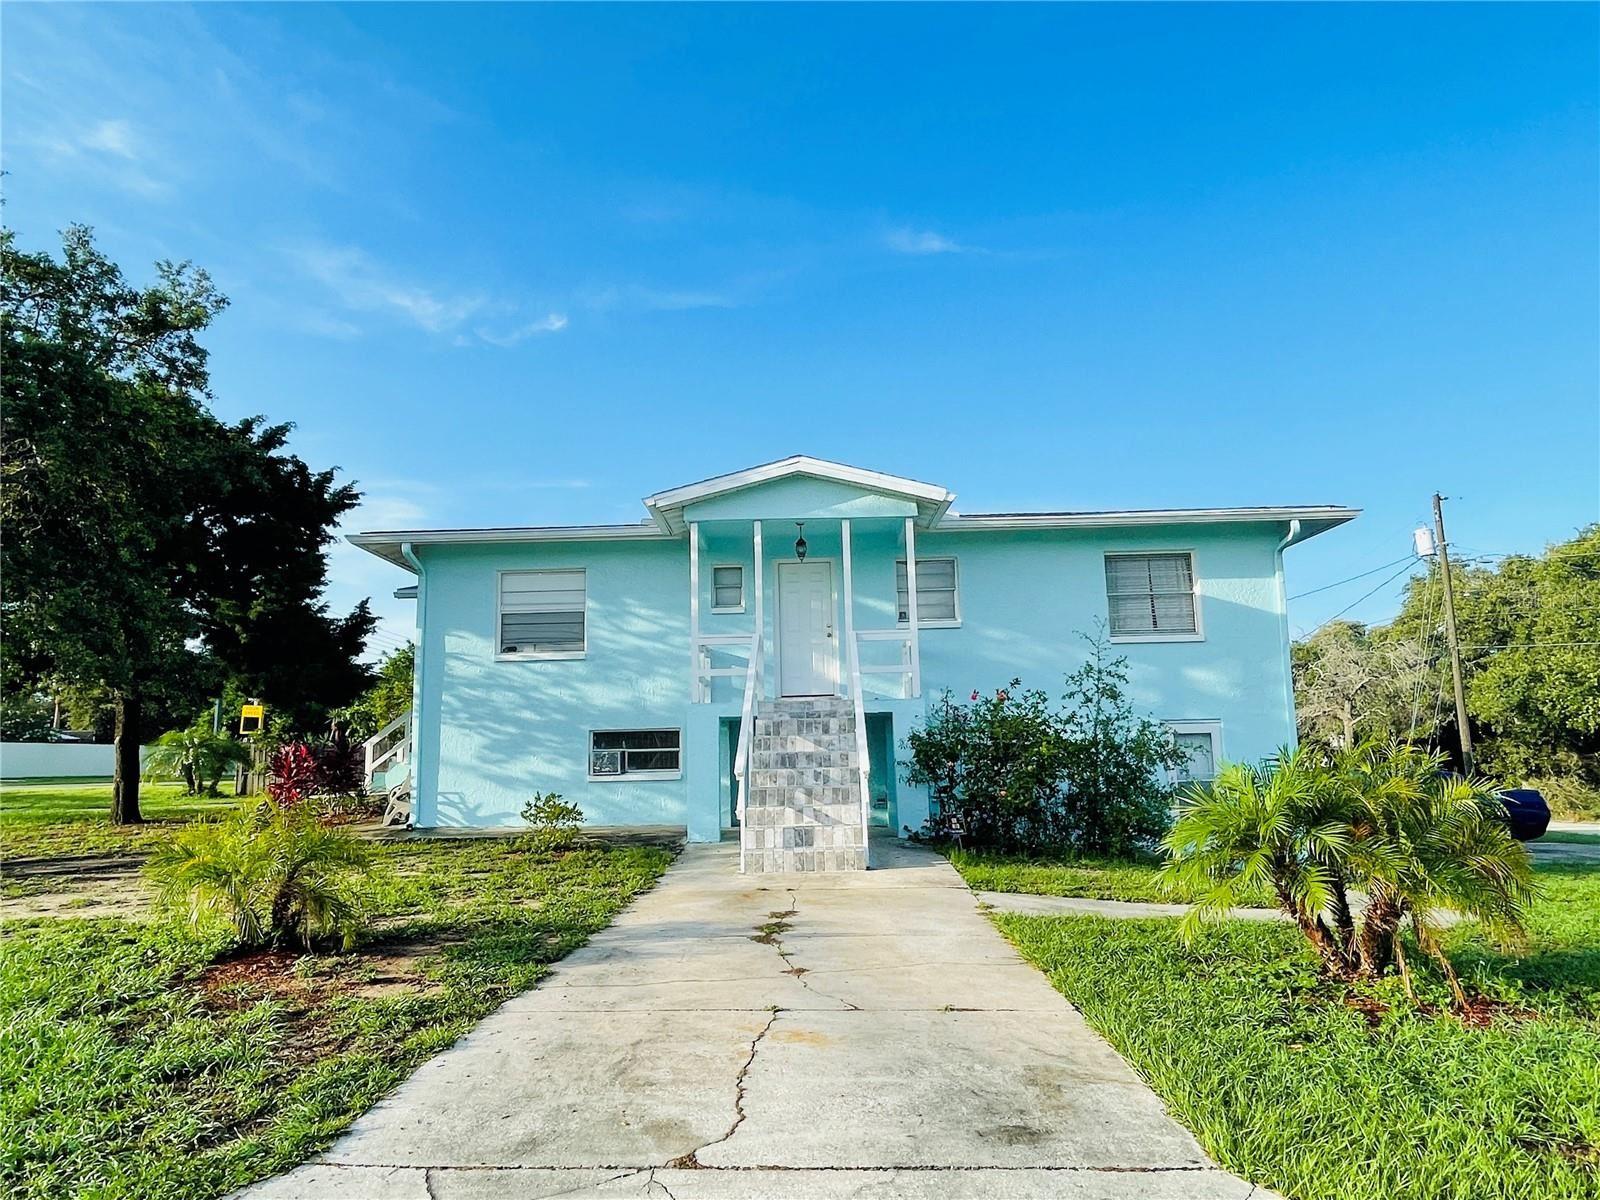 462 S FLORIDA AVENUE, Tarpon Springs, FL 34689 - MLS#: U8131743